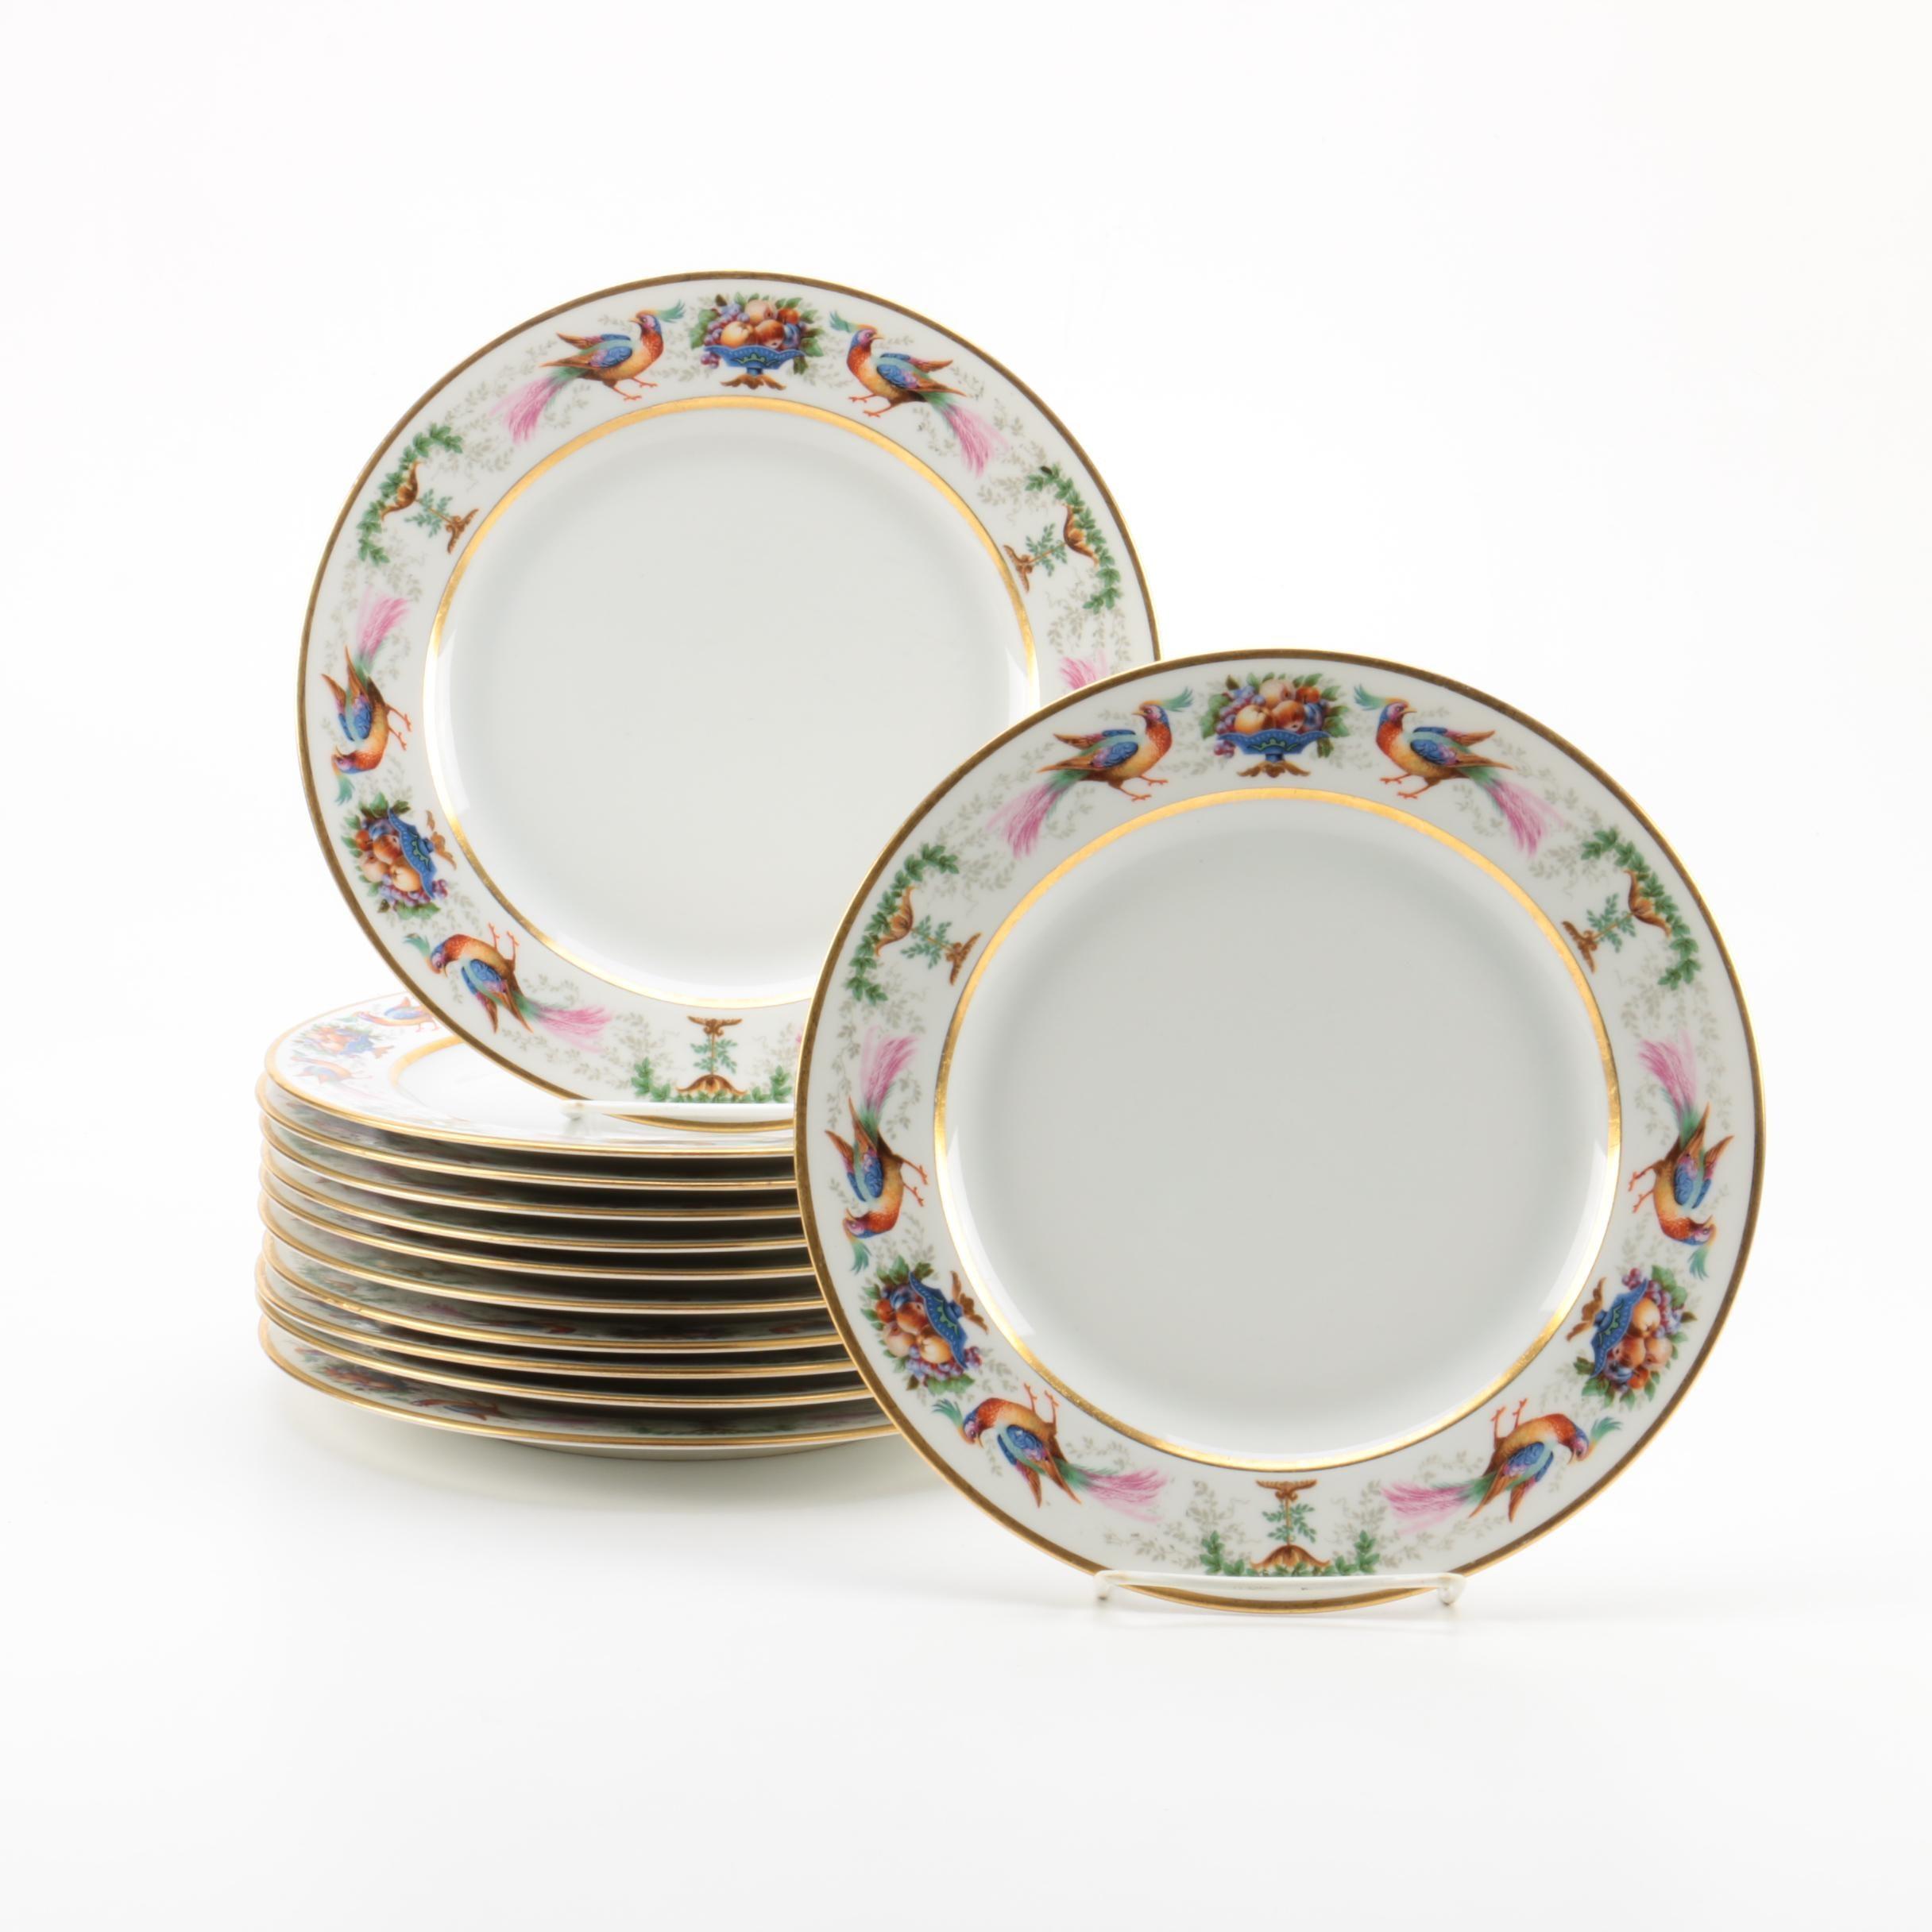 Vintage Hutschenreuther Porcelain Luncheon Plates